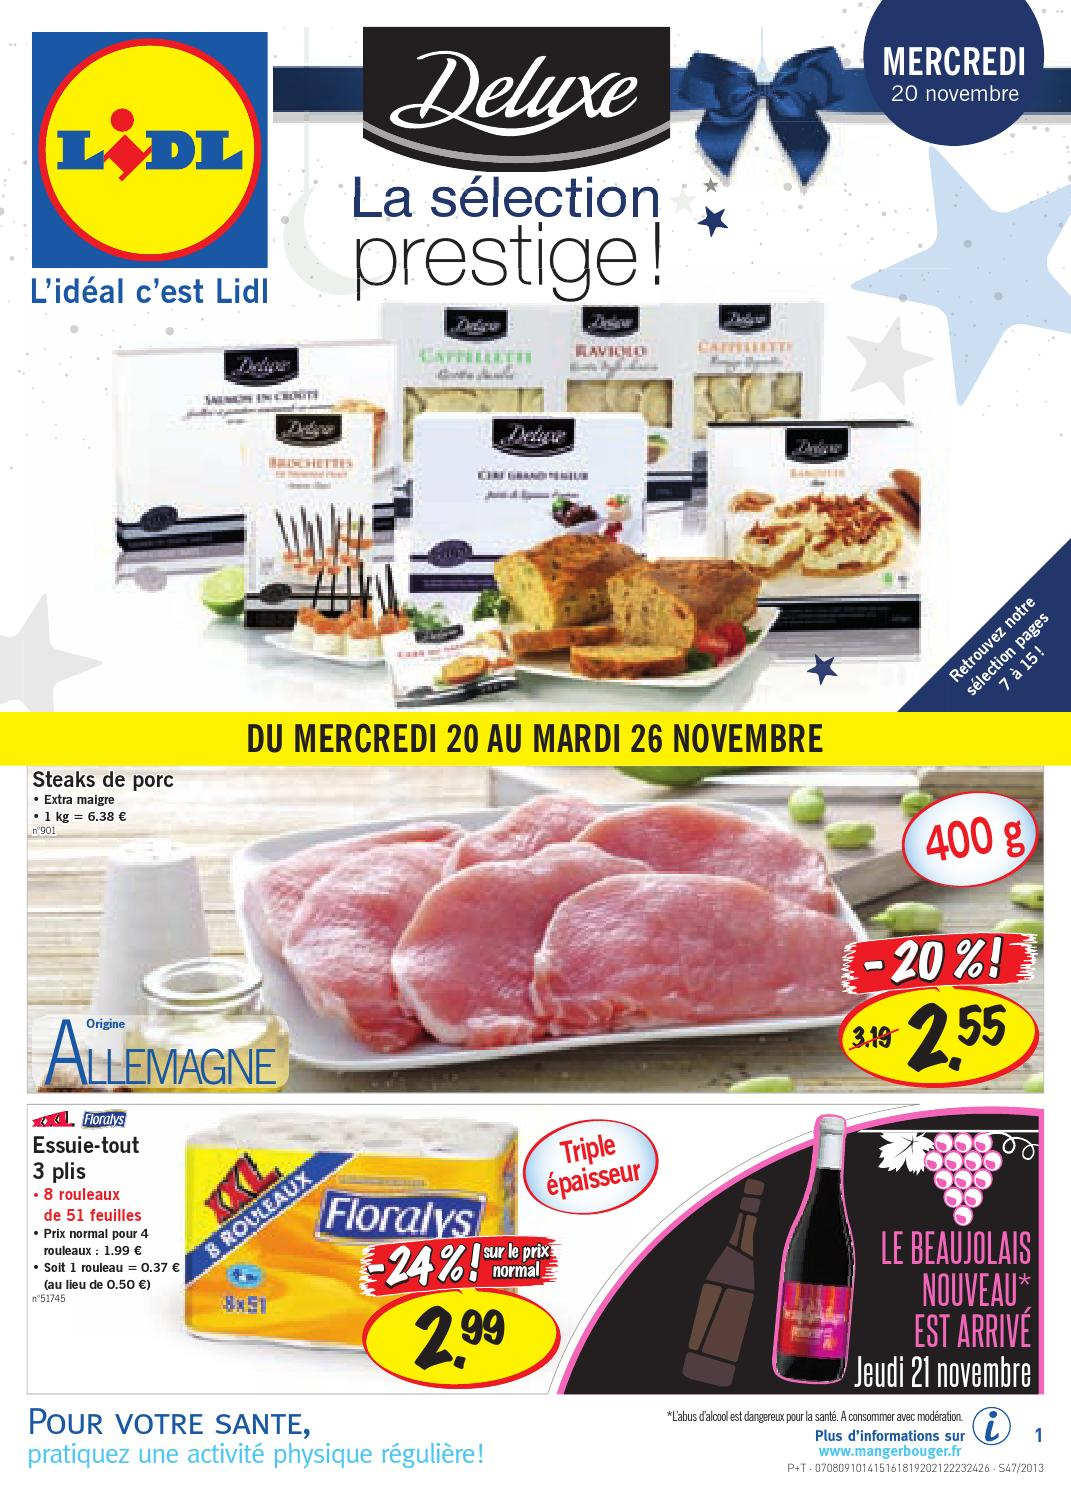 Catalogue lidl 20 by joe monroe issuu - Tollens prix au litre ...